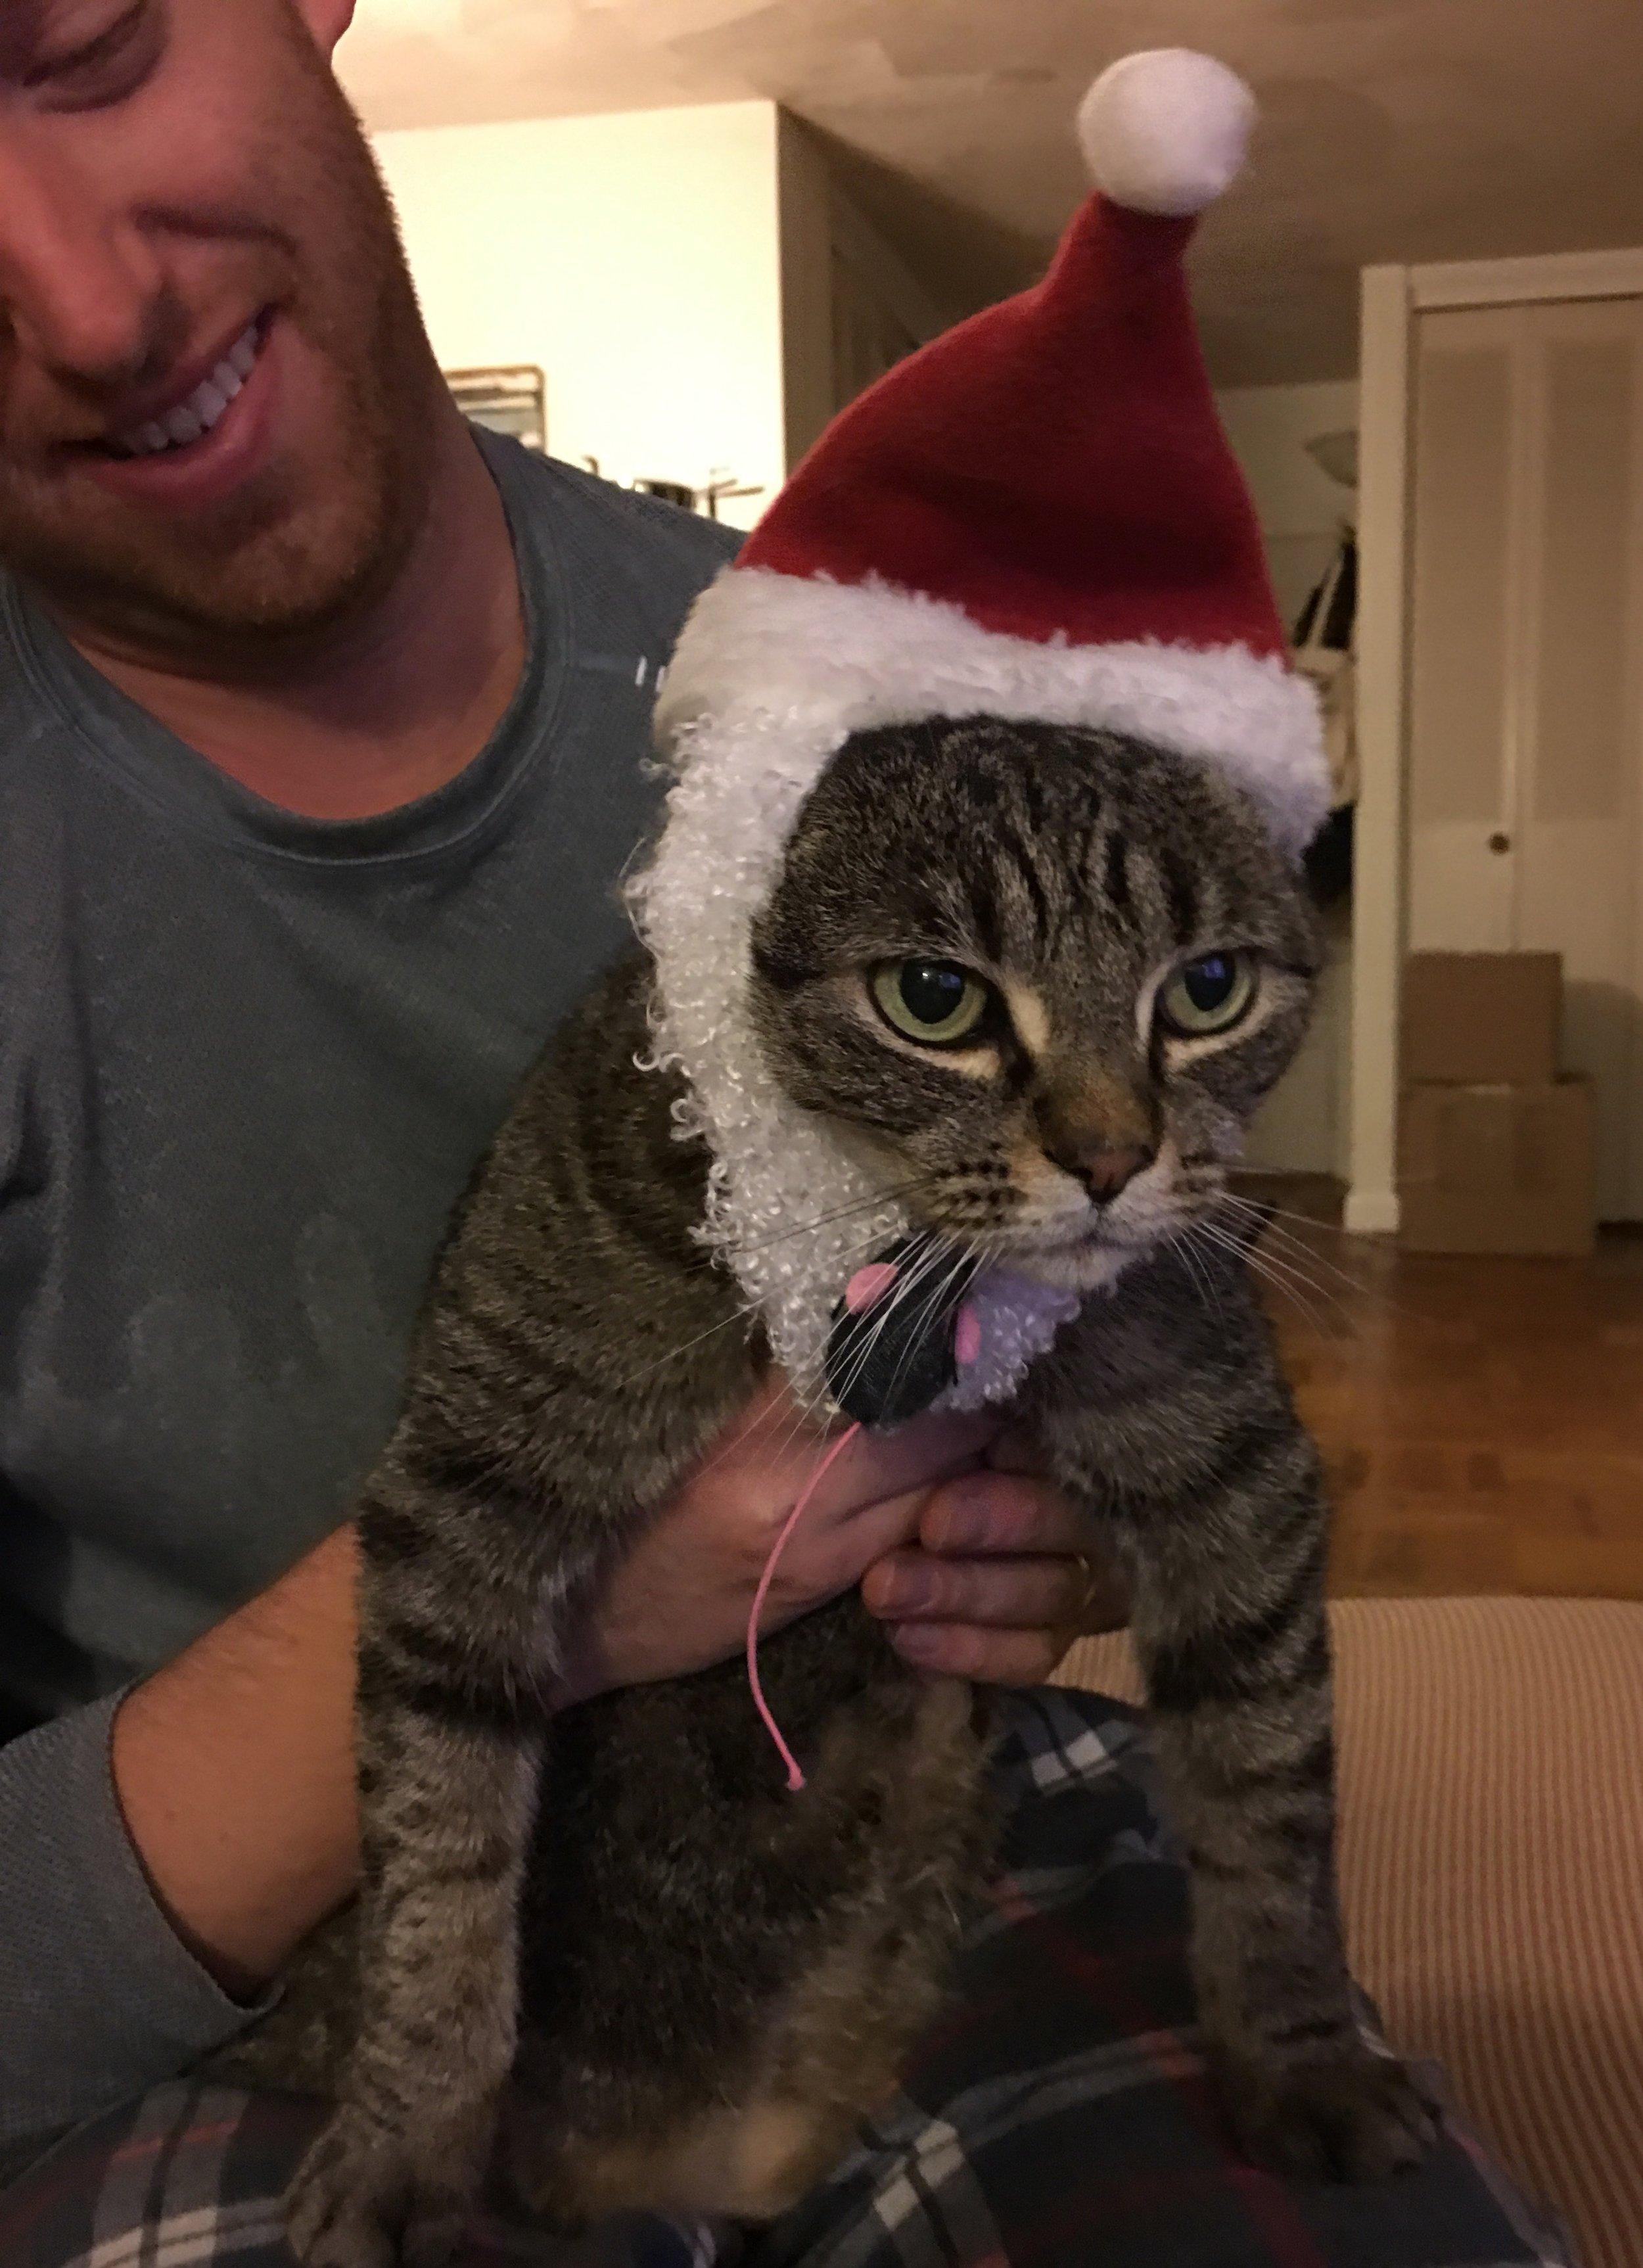 She loves this hat, I promise.